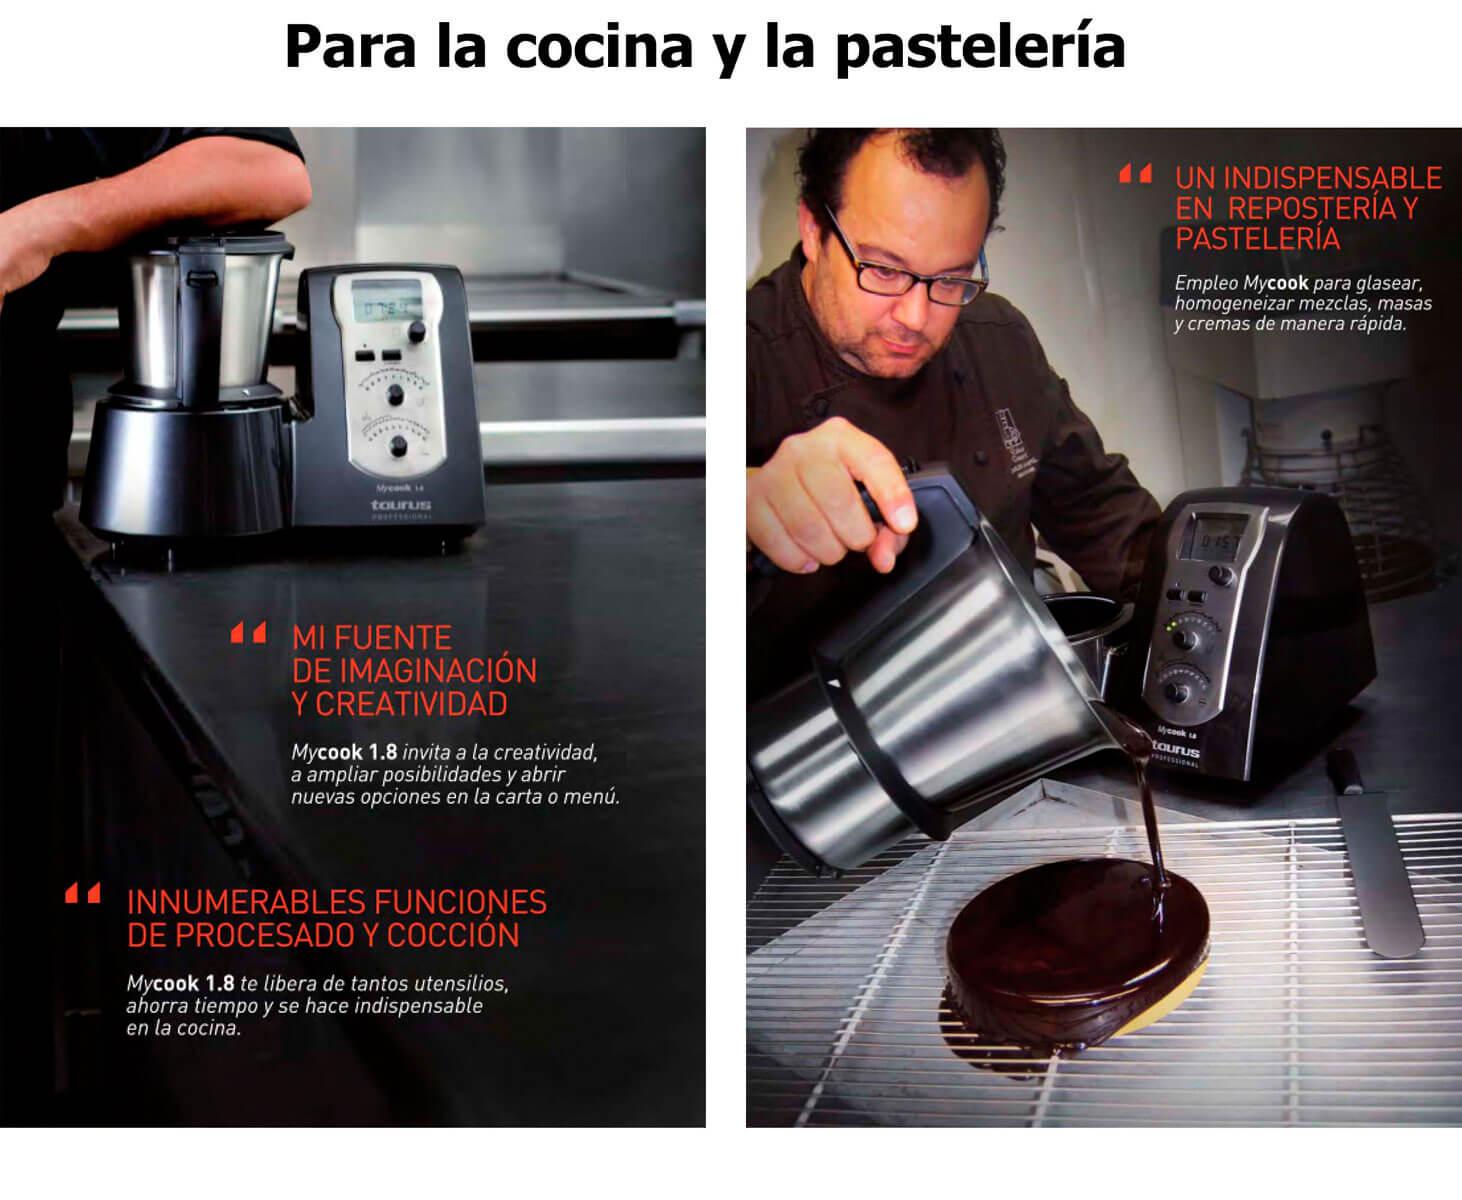 Robot de cocina profesional Taurus My Cook 1.8